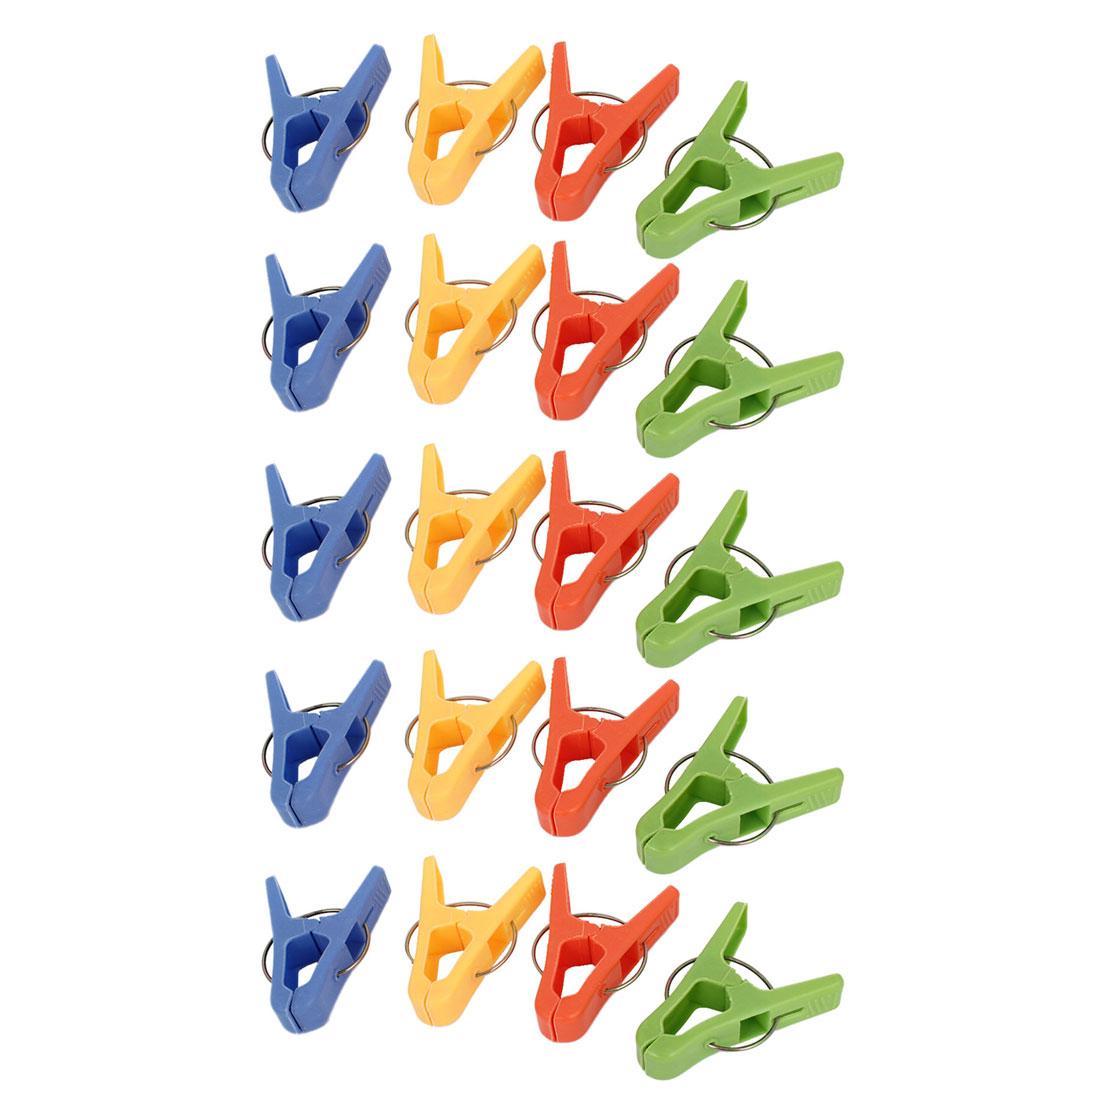 20 Pcs Four Colors Plastic Socks Hanger Clothes Pegs Clips Clothespins